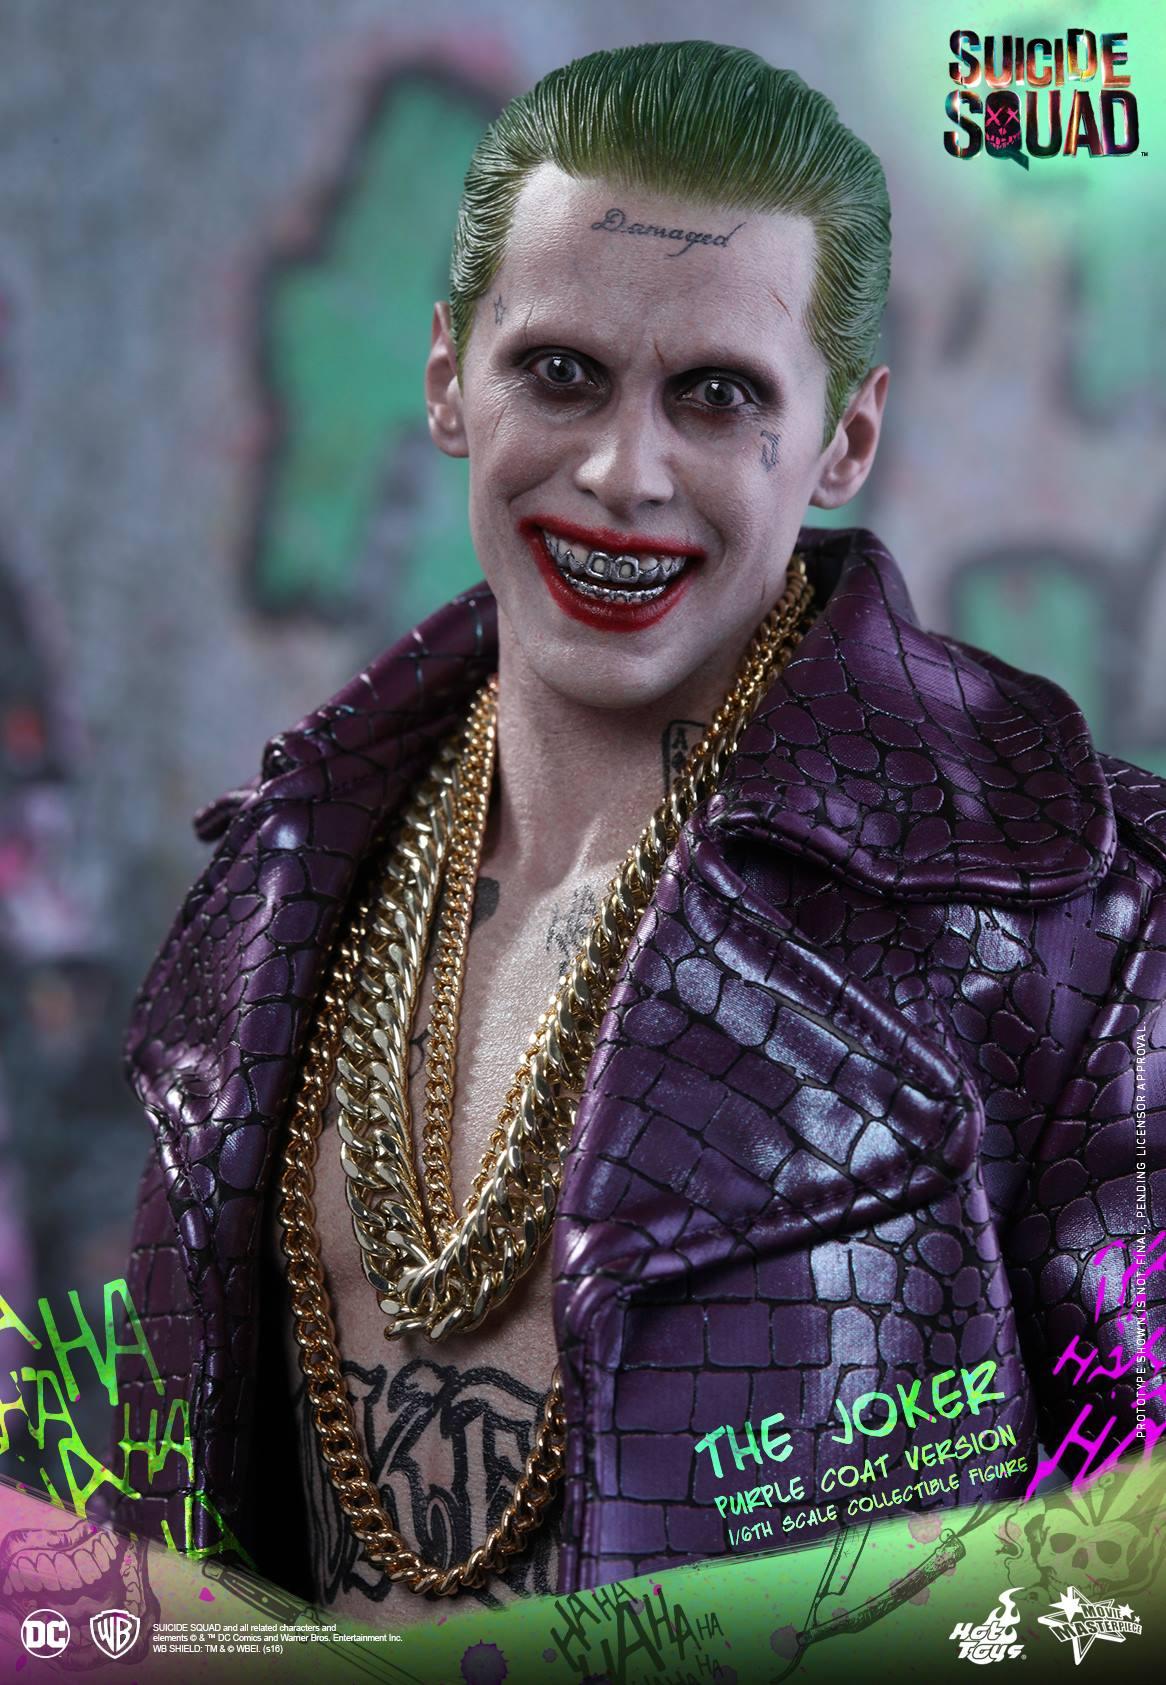 Hot-Toys-Suicide-Squad-Joker-Purple-Coat-8